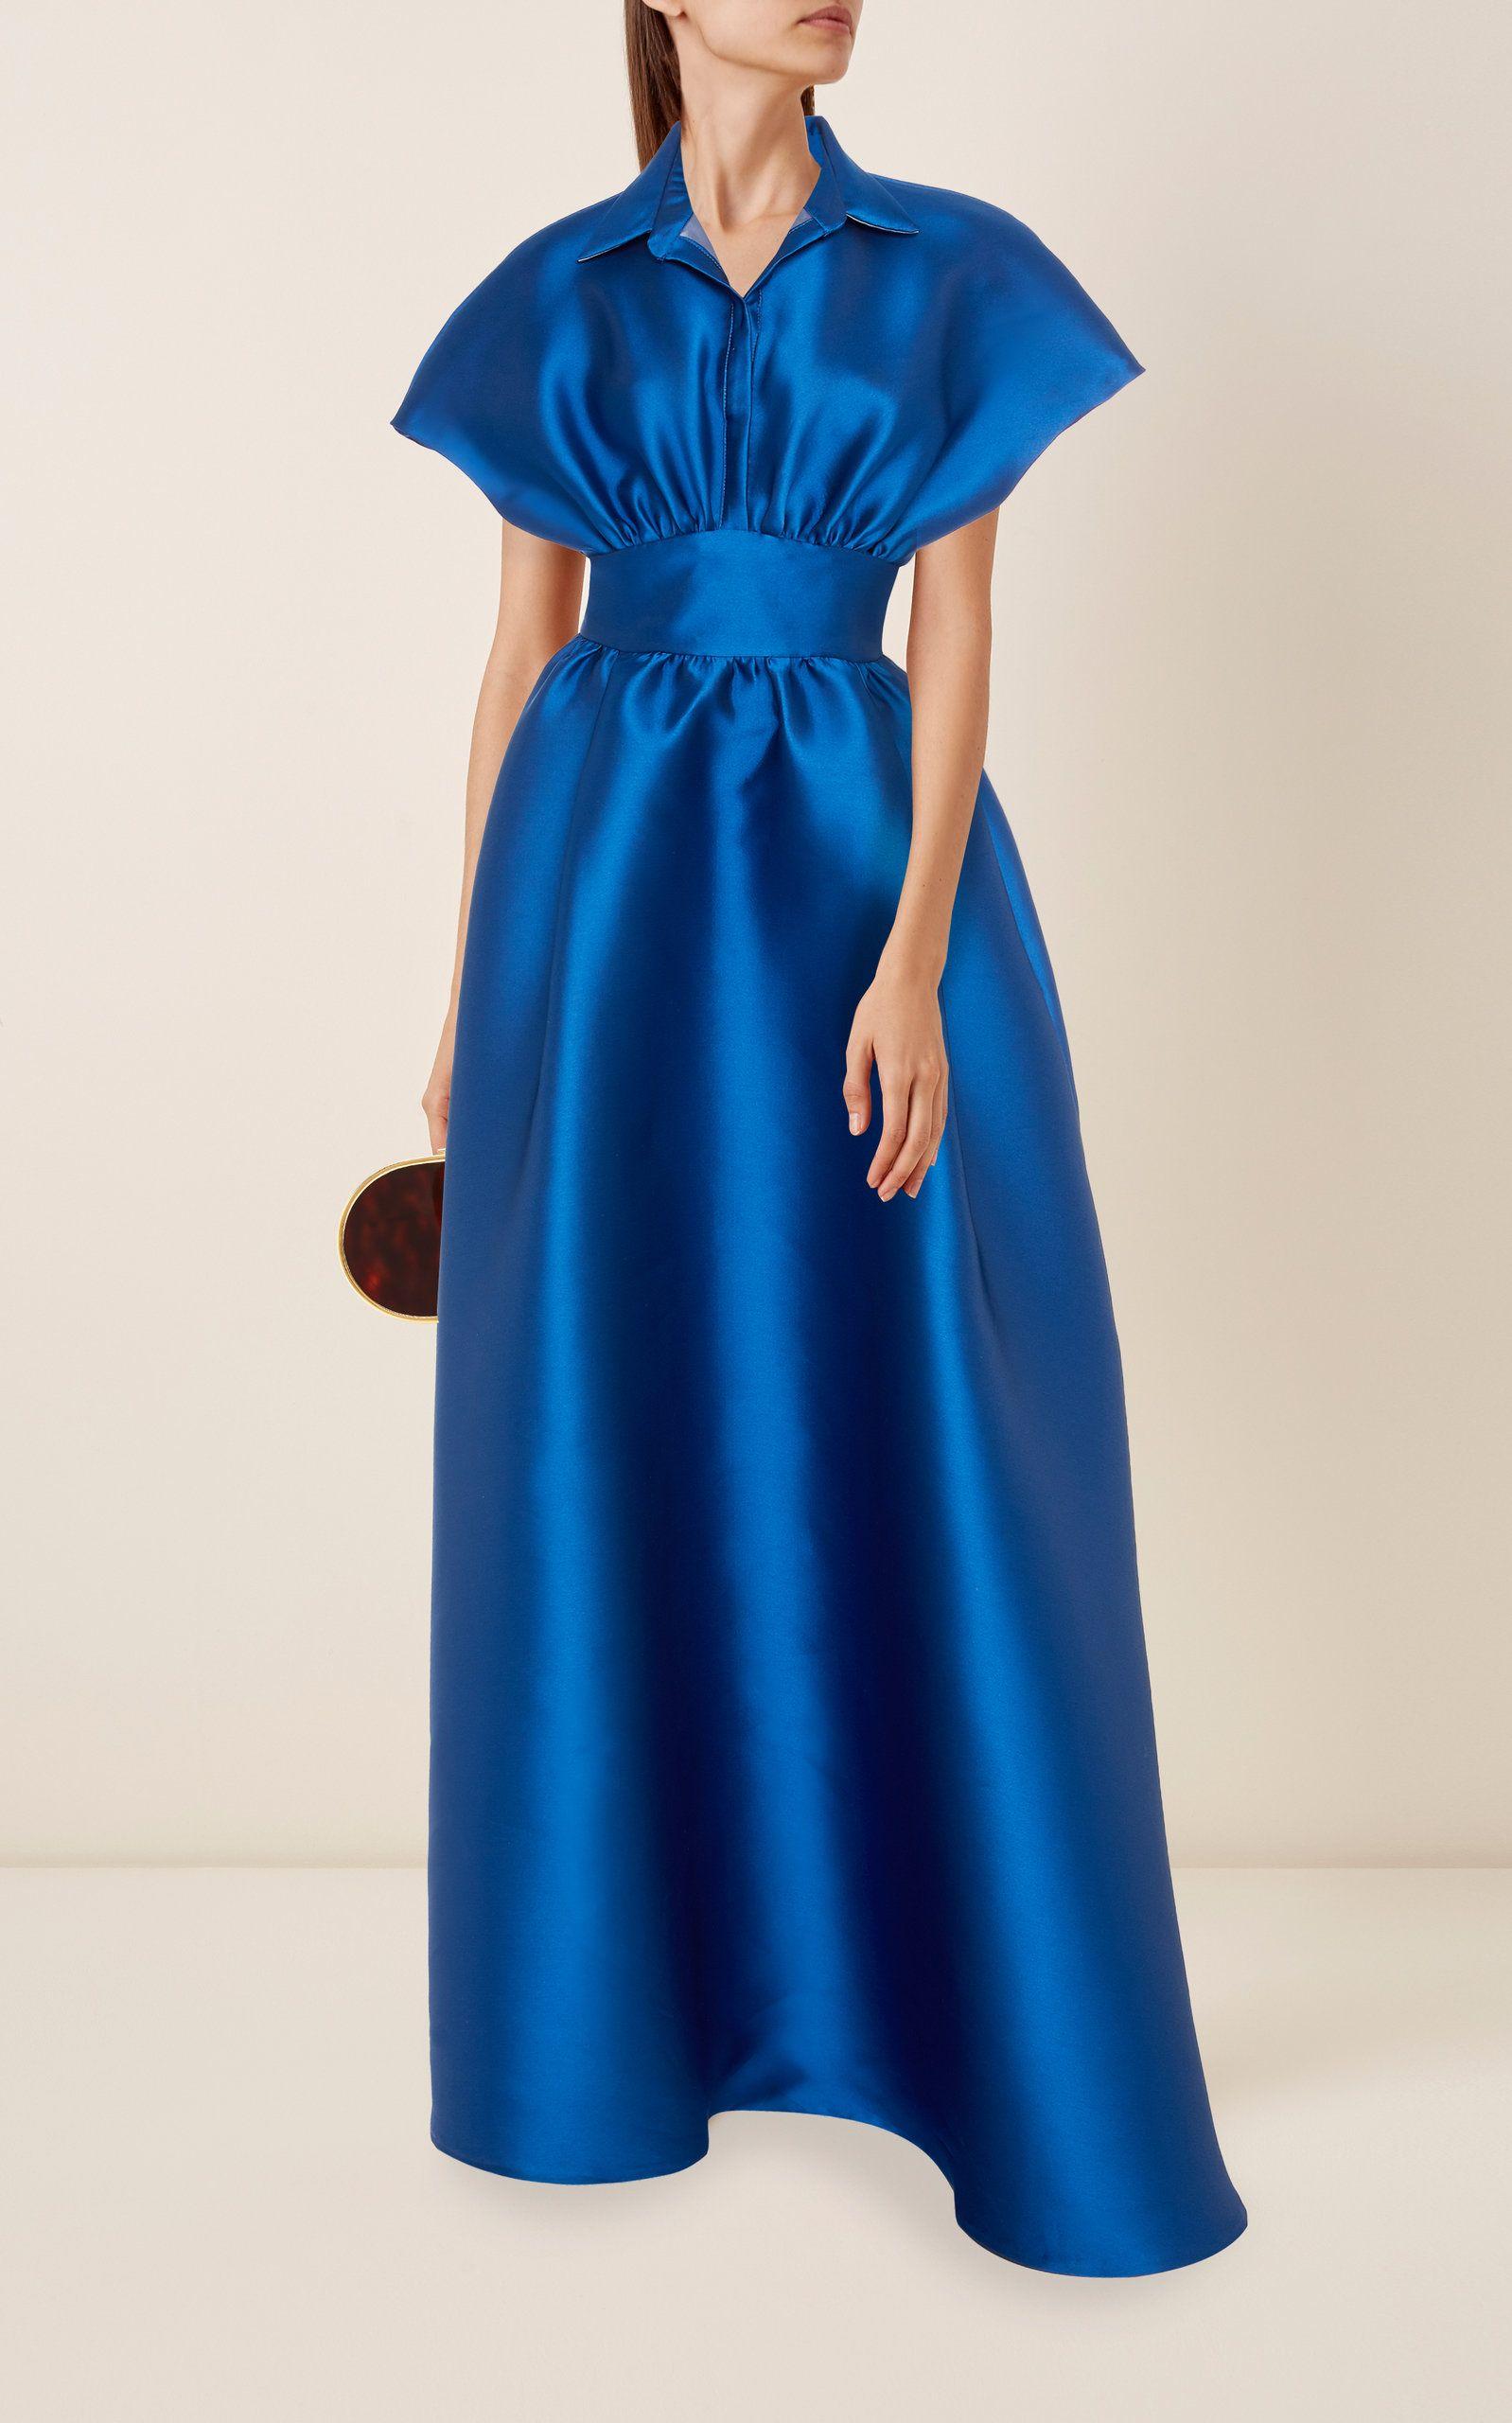 Lela Rose Gathered Duchess Satin Gown